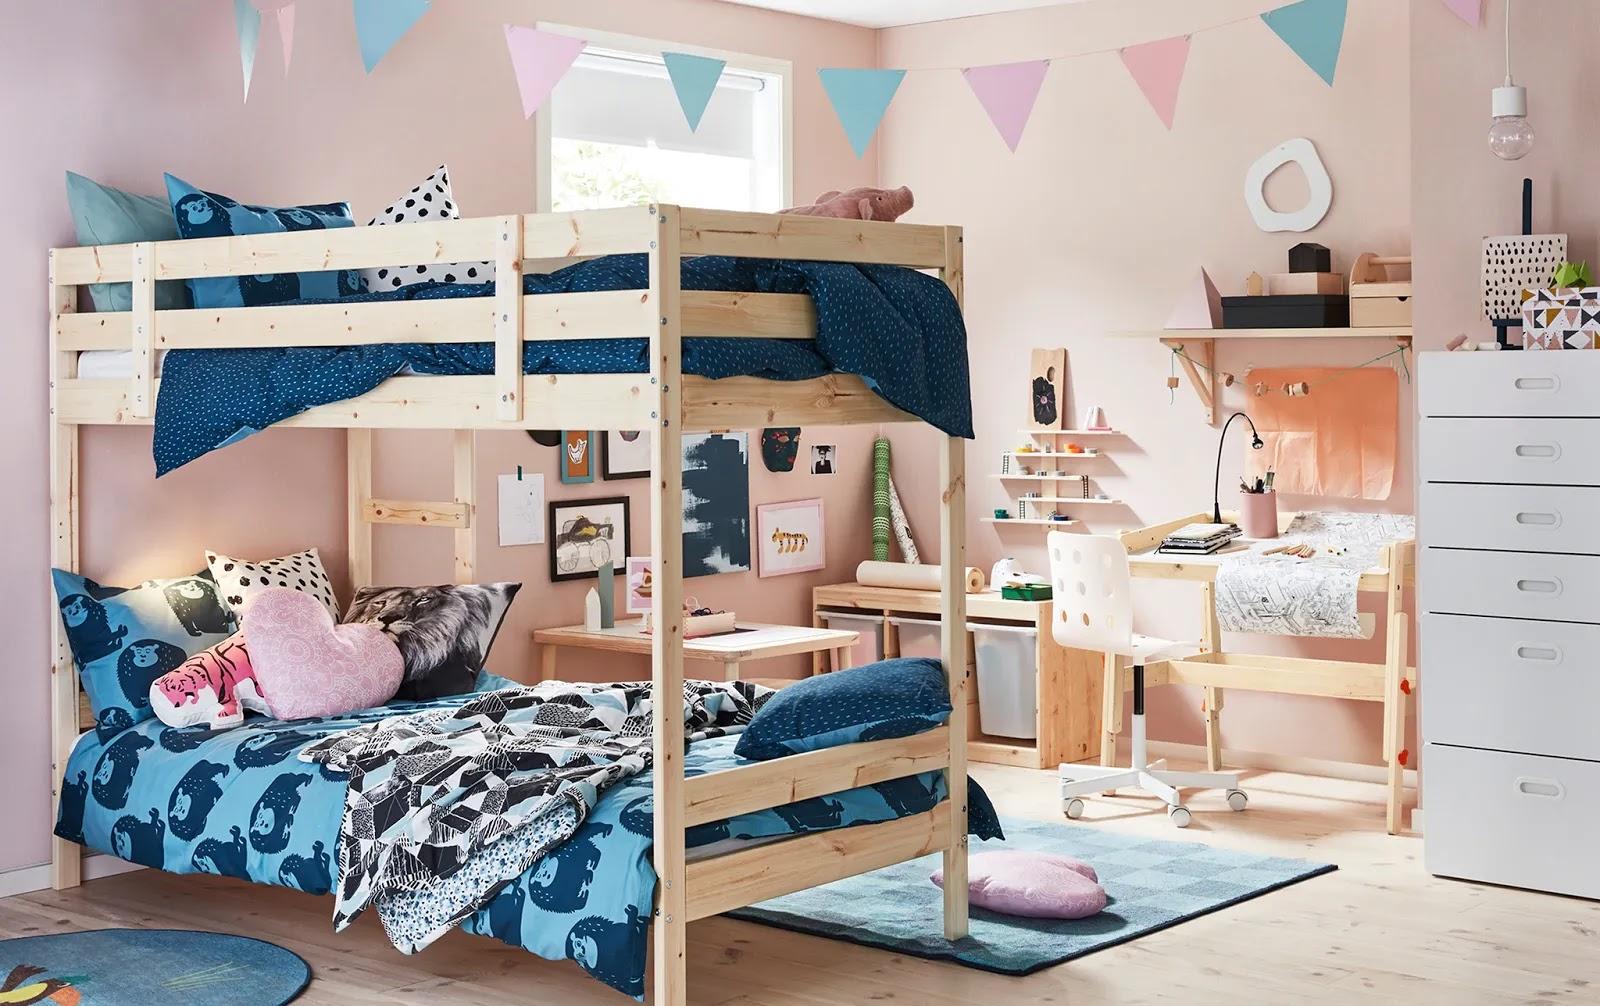 d5333b73d ... غرف نوم اطفال,غرف اطفال,غرف نوم,اوض نوم اطفال,اطفال, ...